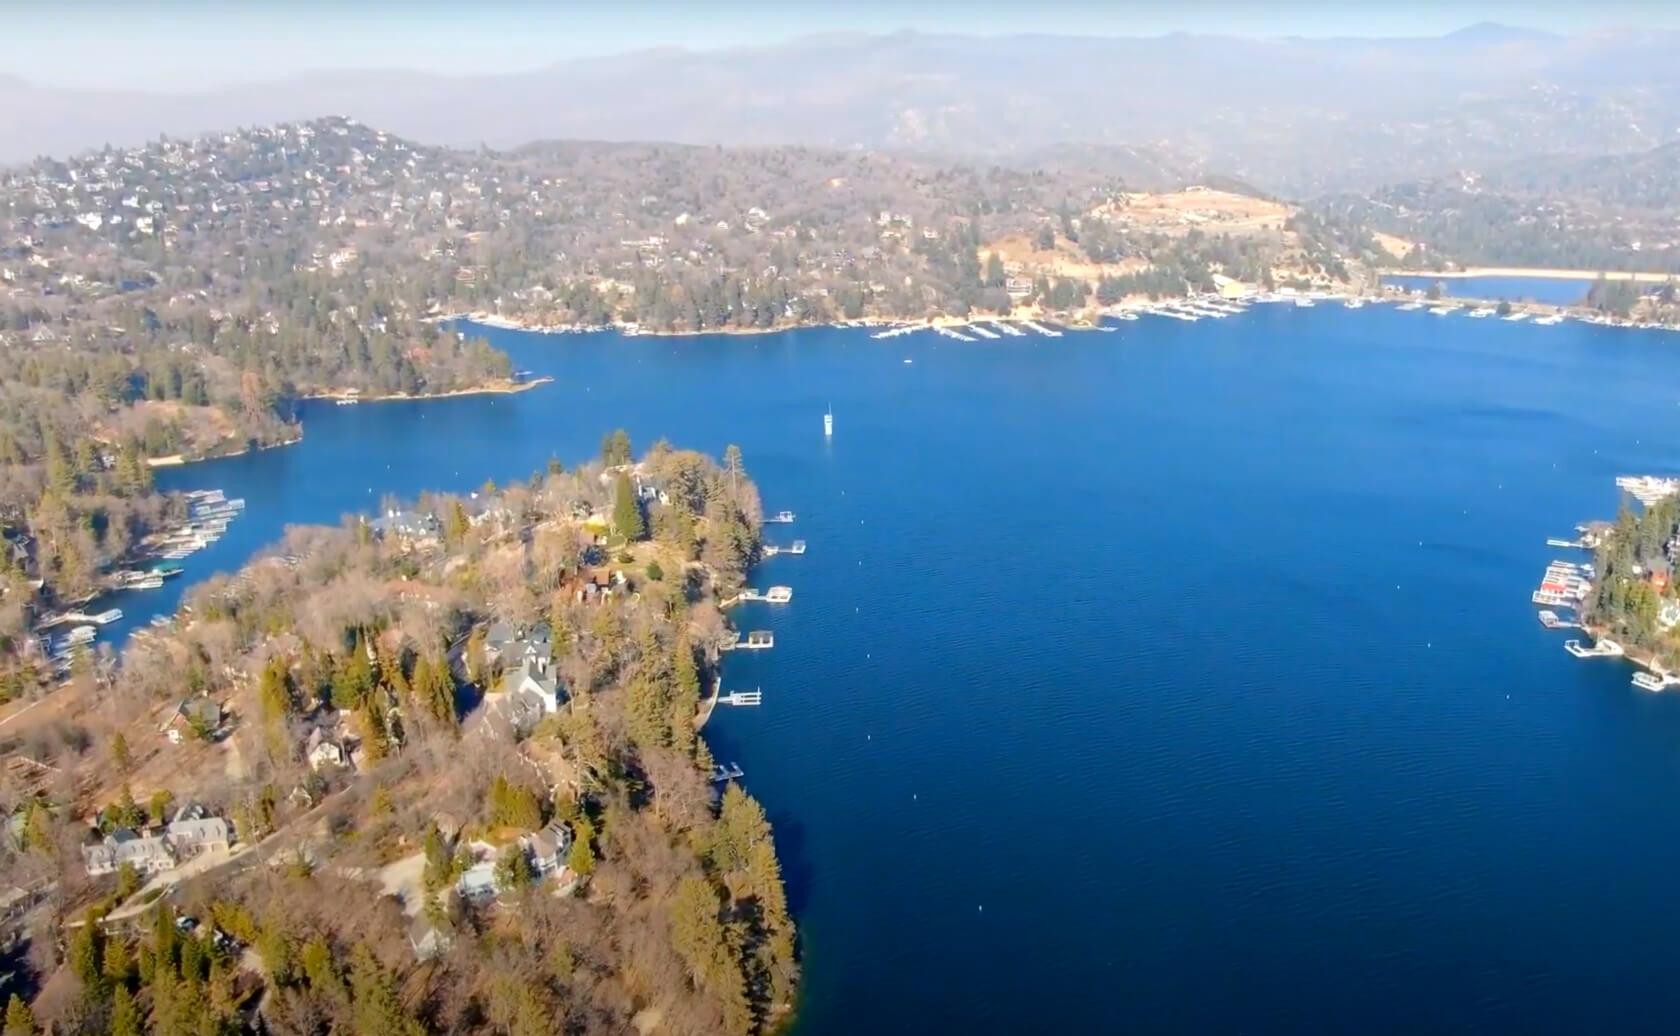 Lake-Arrowhead-CA-Fishing-Guide-08